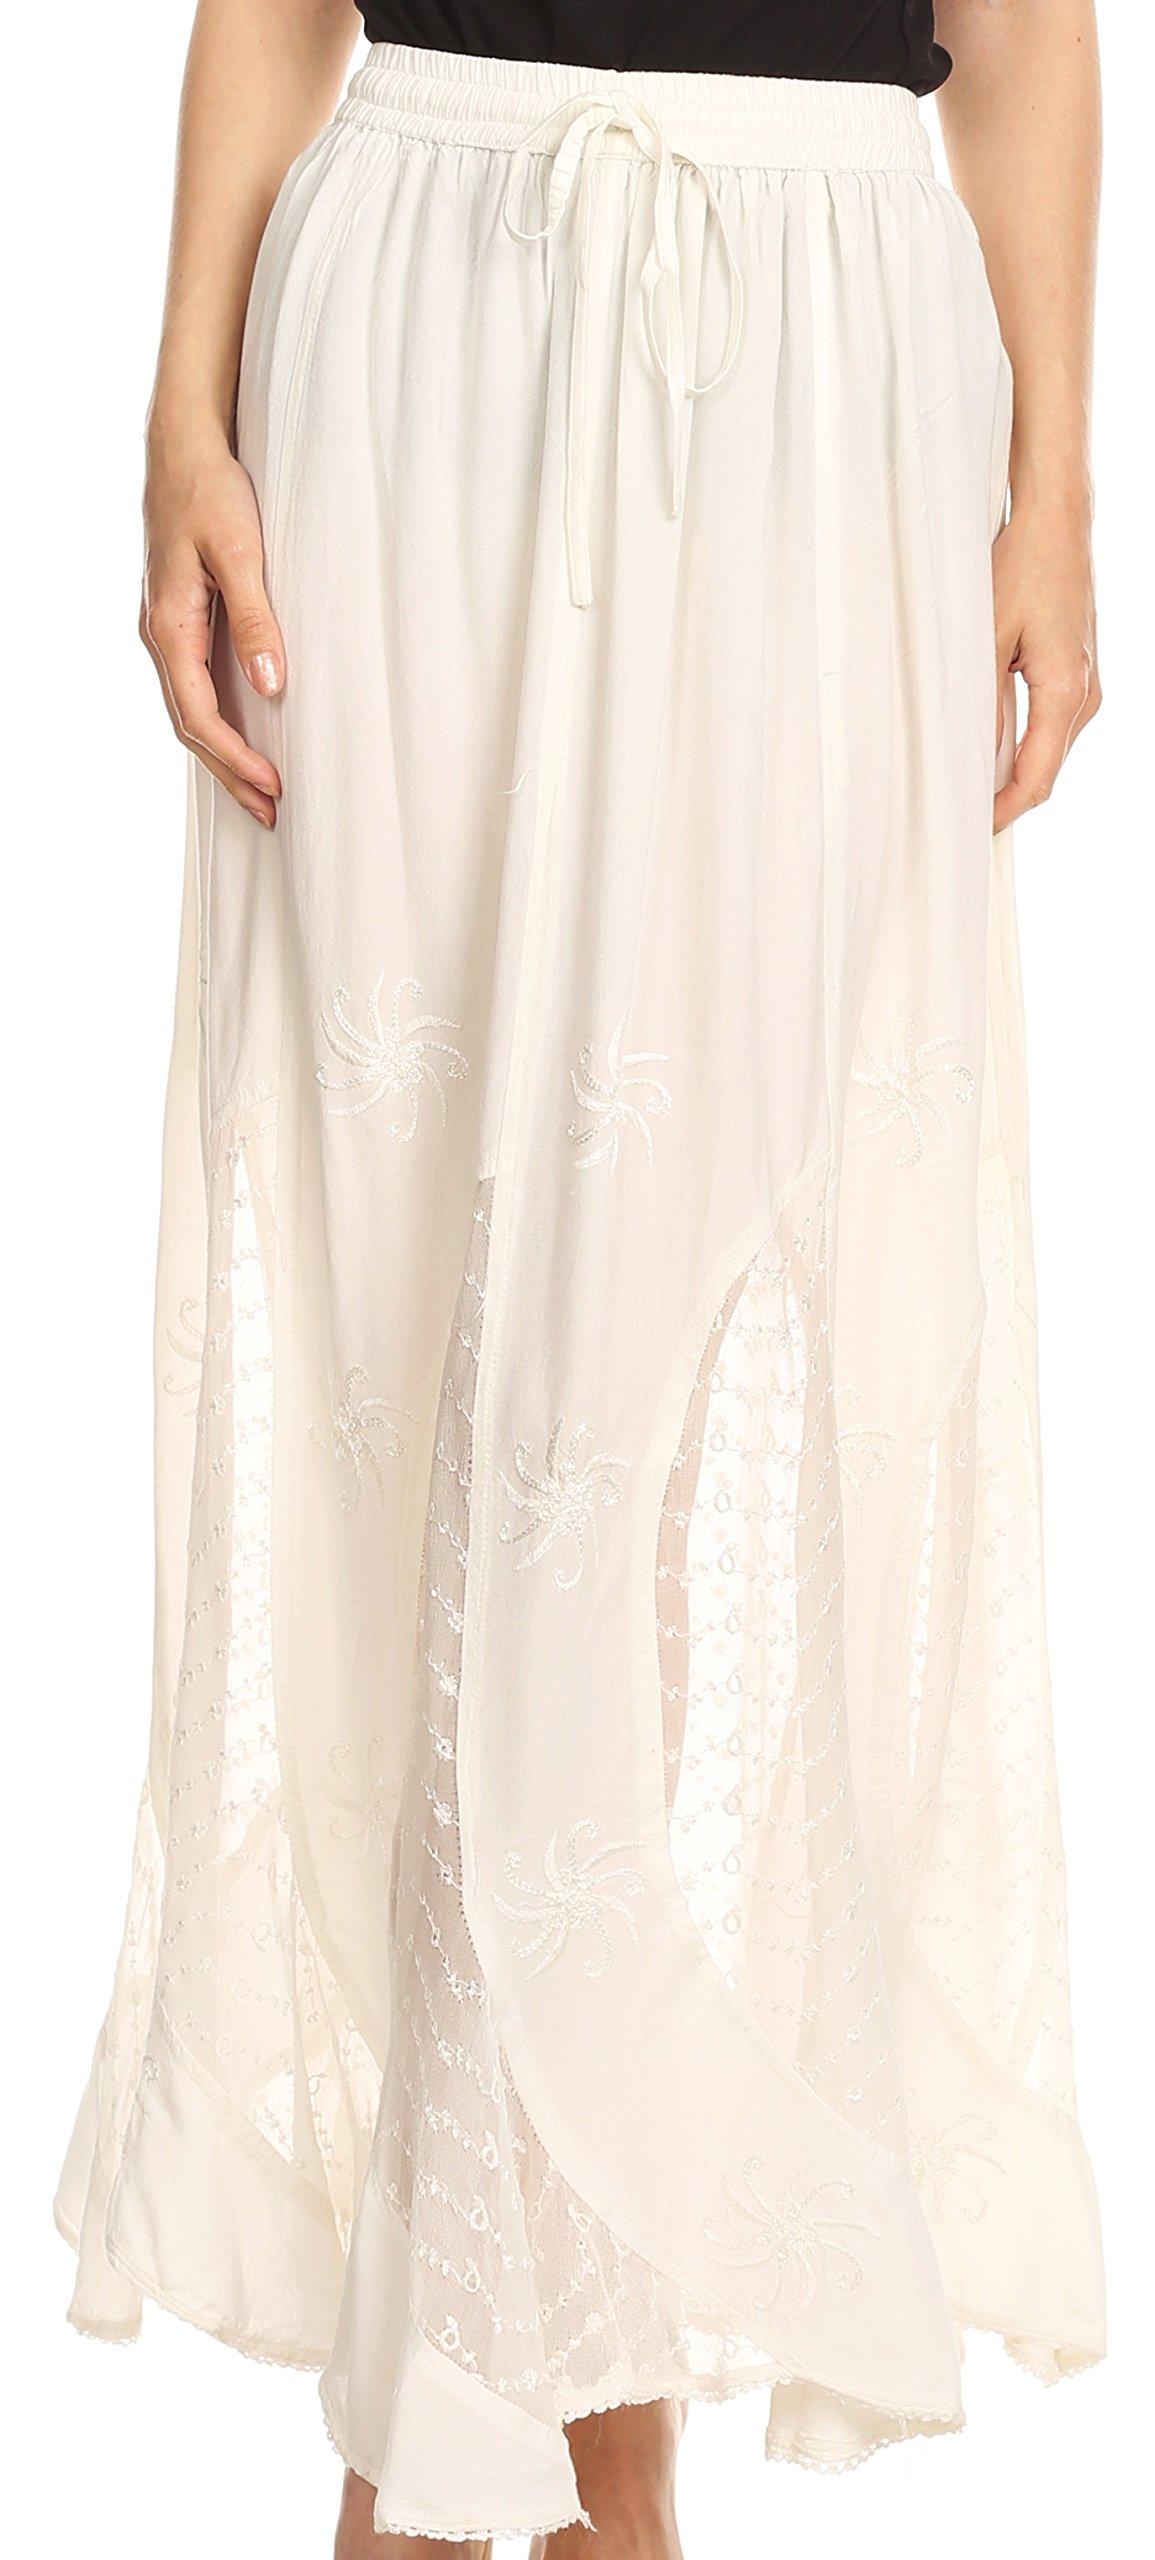 Sakkas 6008 - Aleja Womens Bohemian Gypsy Maxi Long Skirt Adjustable Elastic Waist Lace - Natural - XL